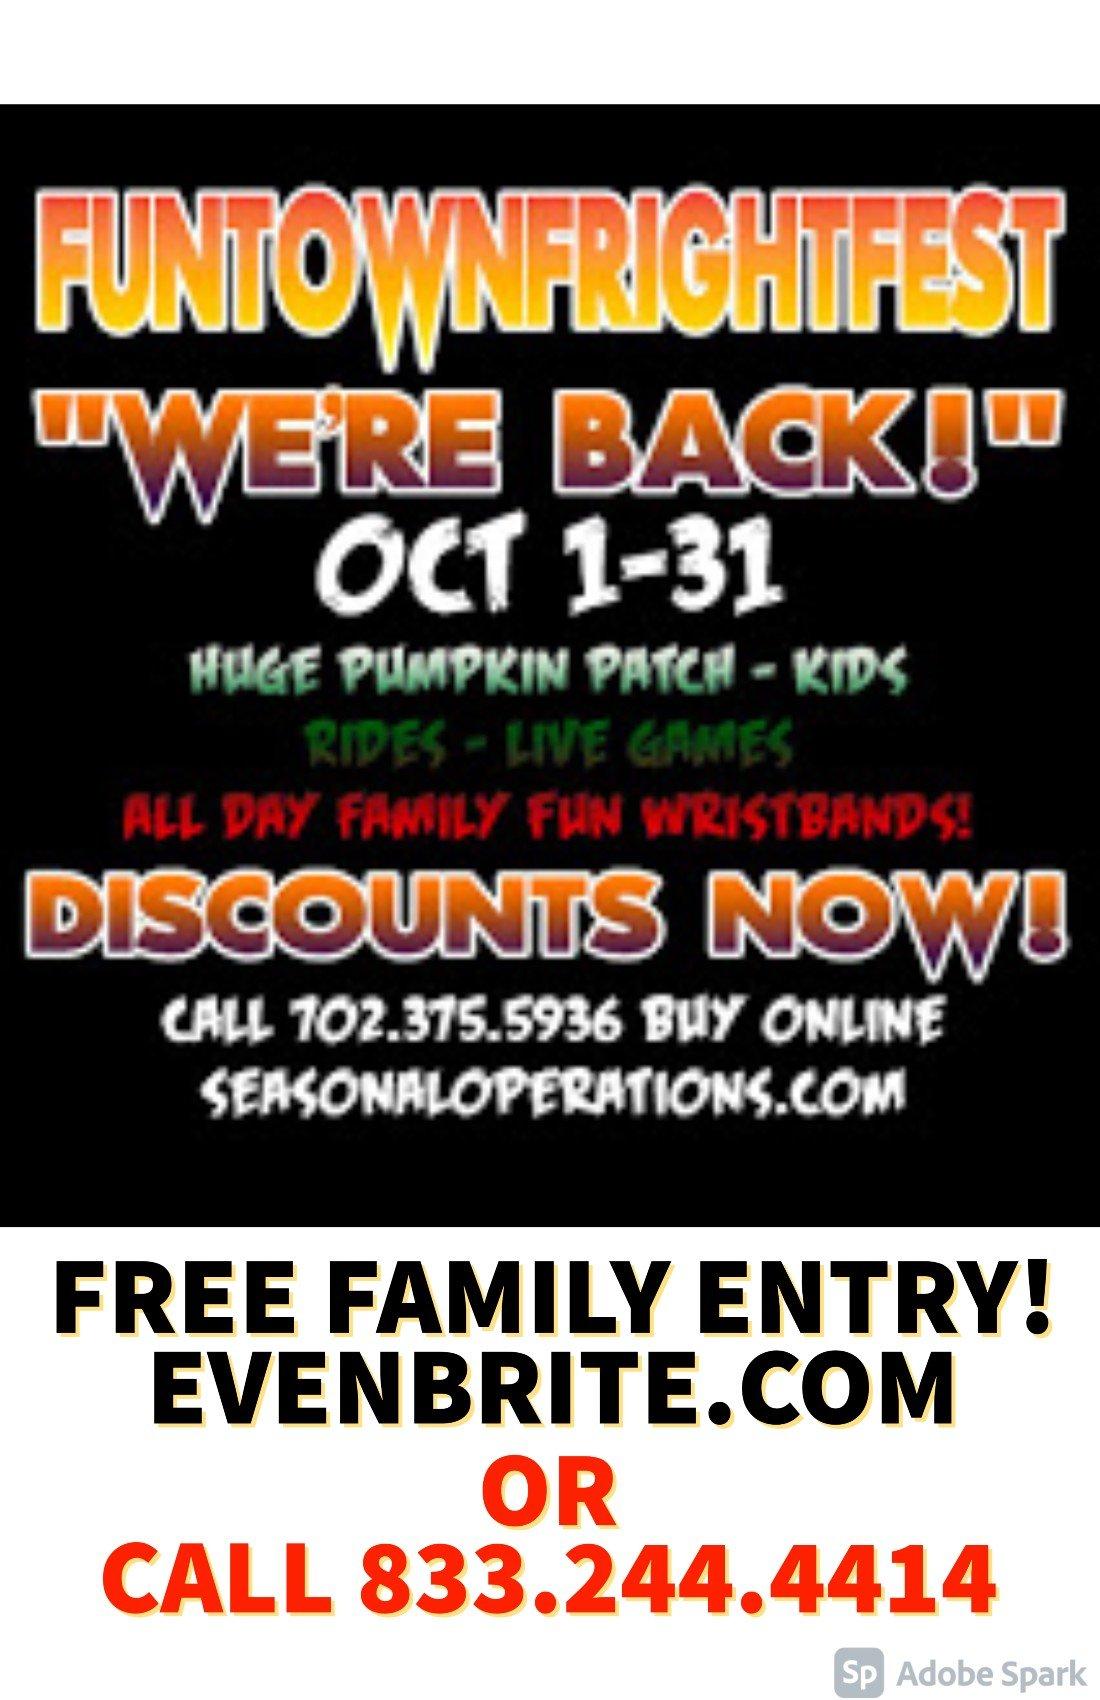 11th ANNUAL FUNTOWN FRIGHTFEST FAMILY HALLOWEEN FESTIVAL & PUMPKIN PACTH